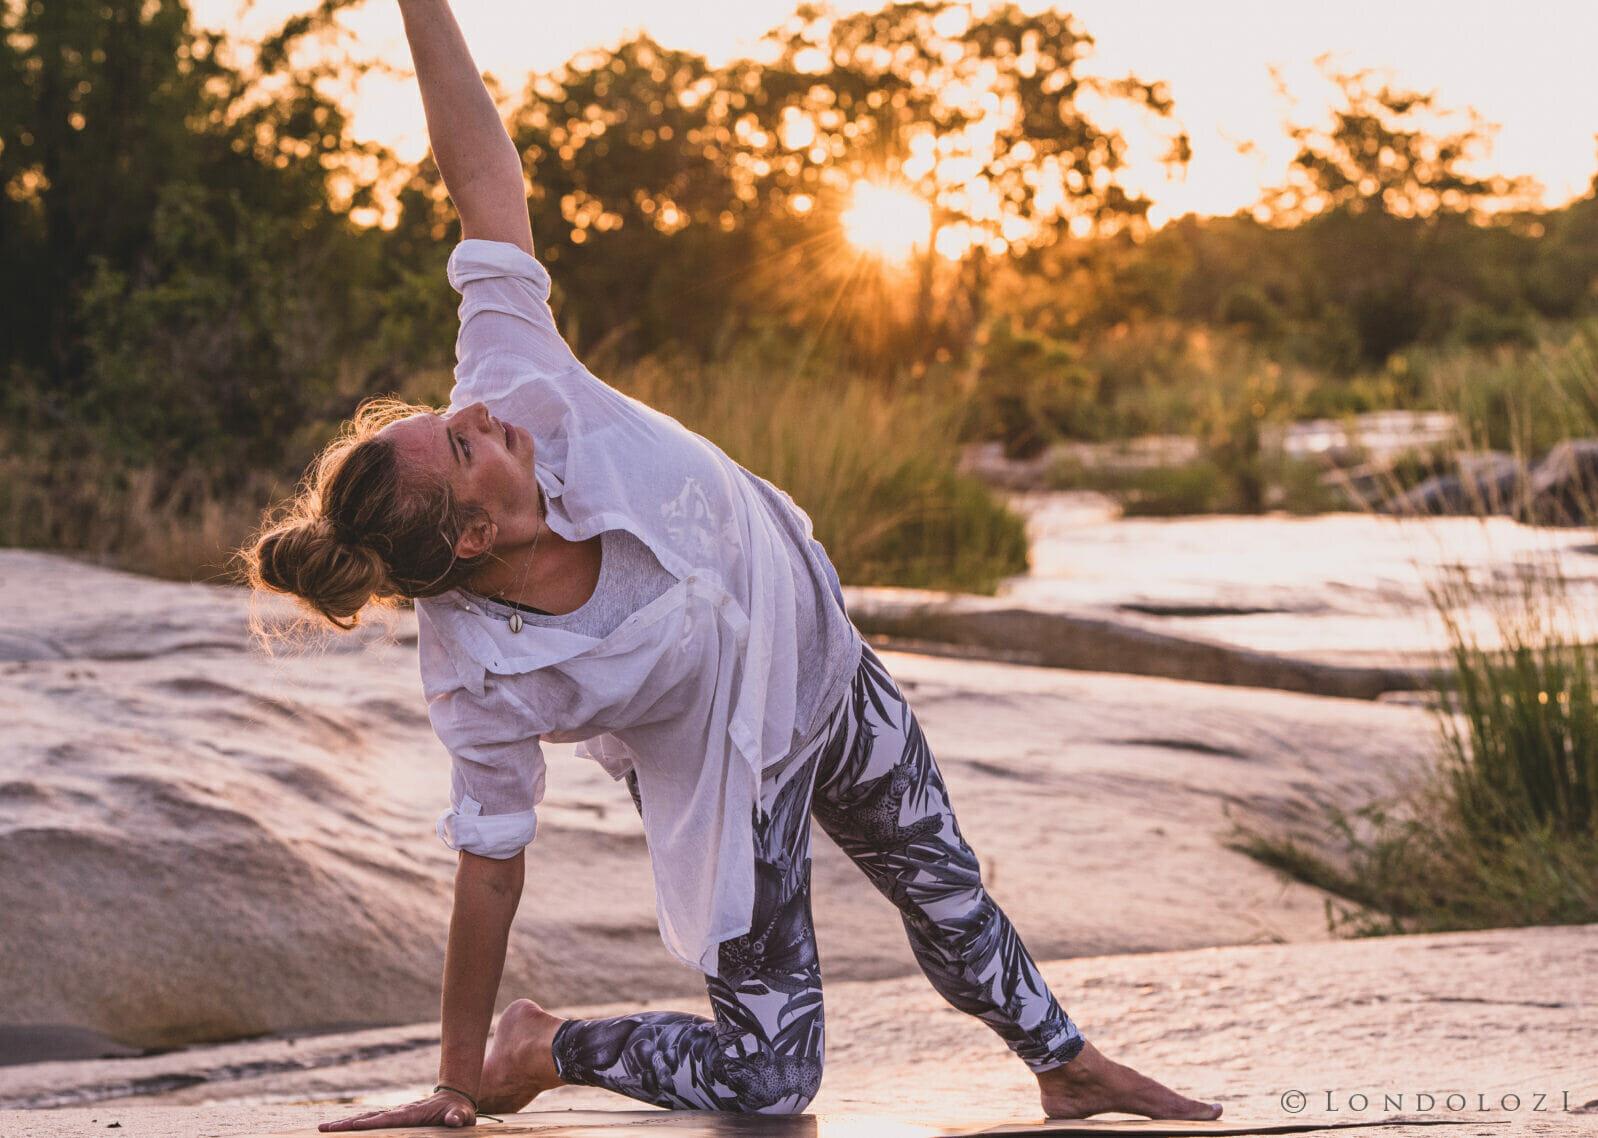 Londolozi Yoga Wild A Ritchie 1679